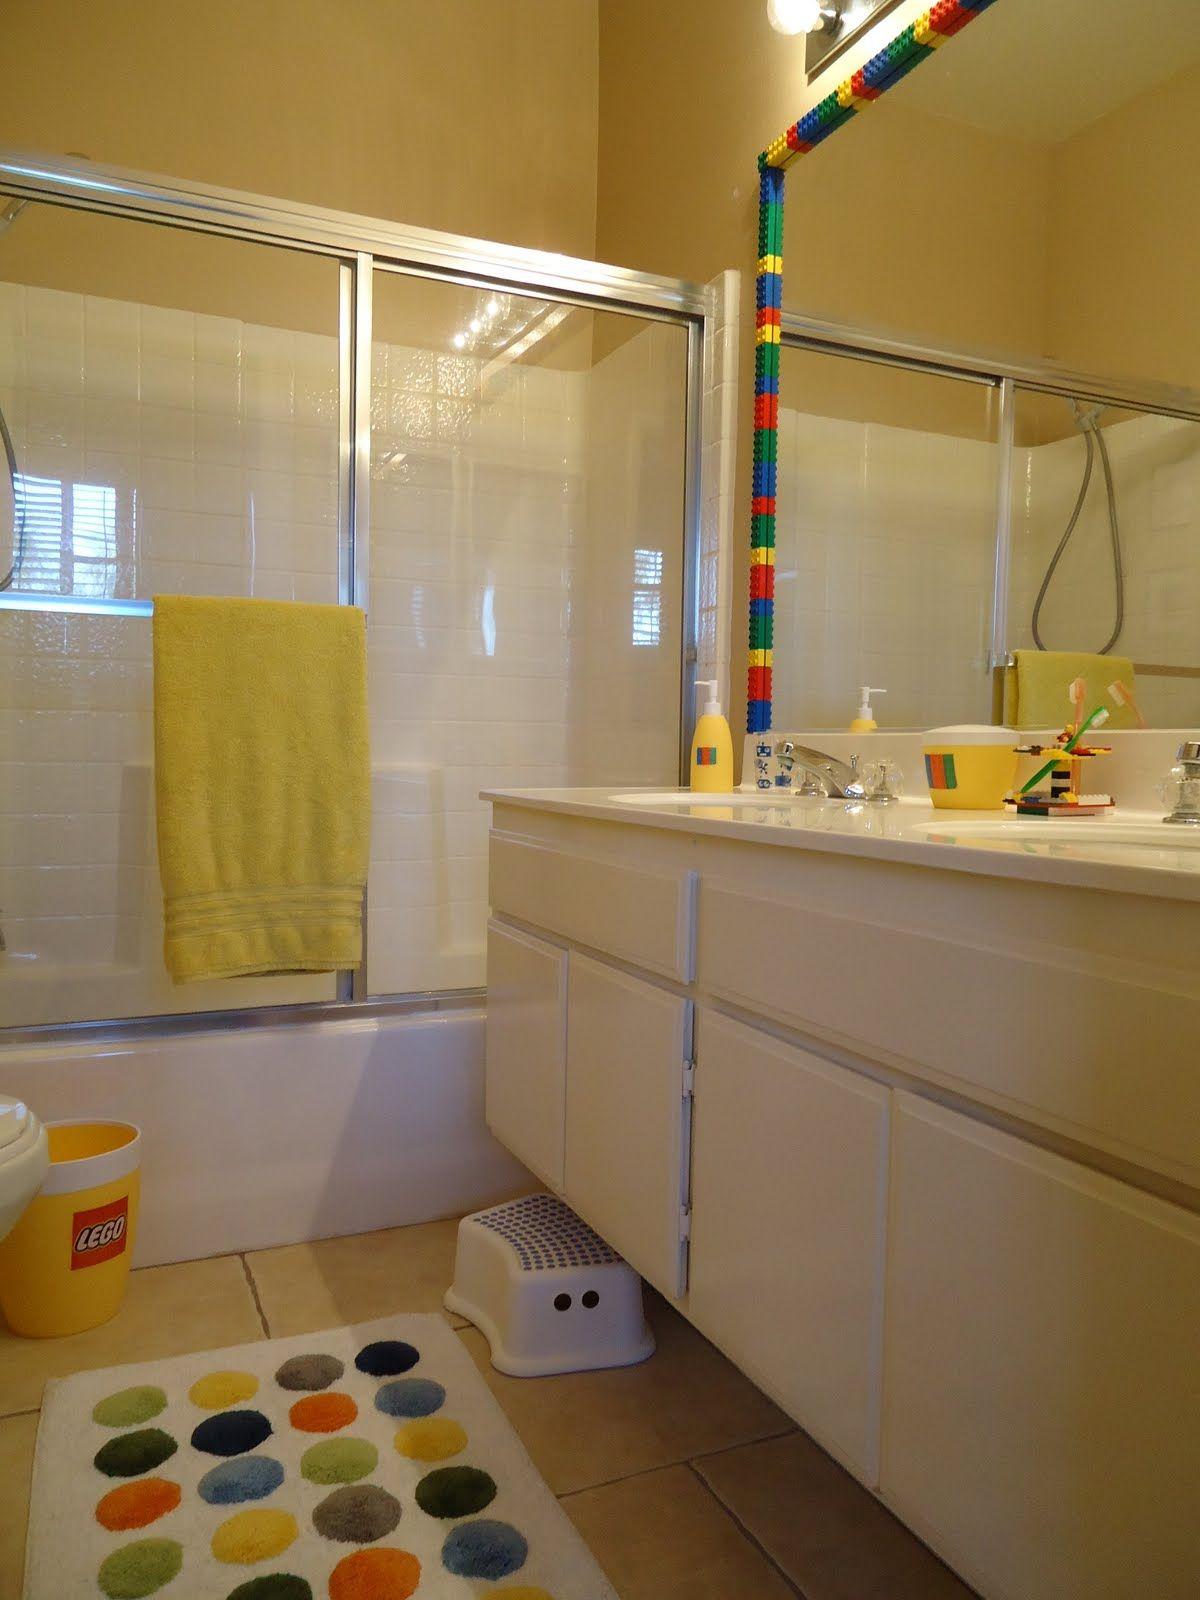 30 Bathroom Sets Design Ideas With Images Kid Bathroom Decor